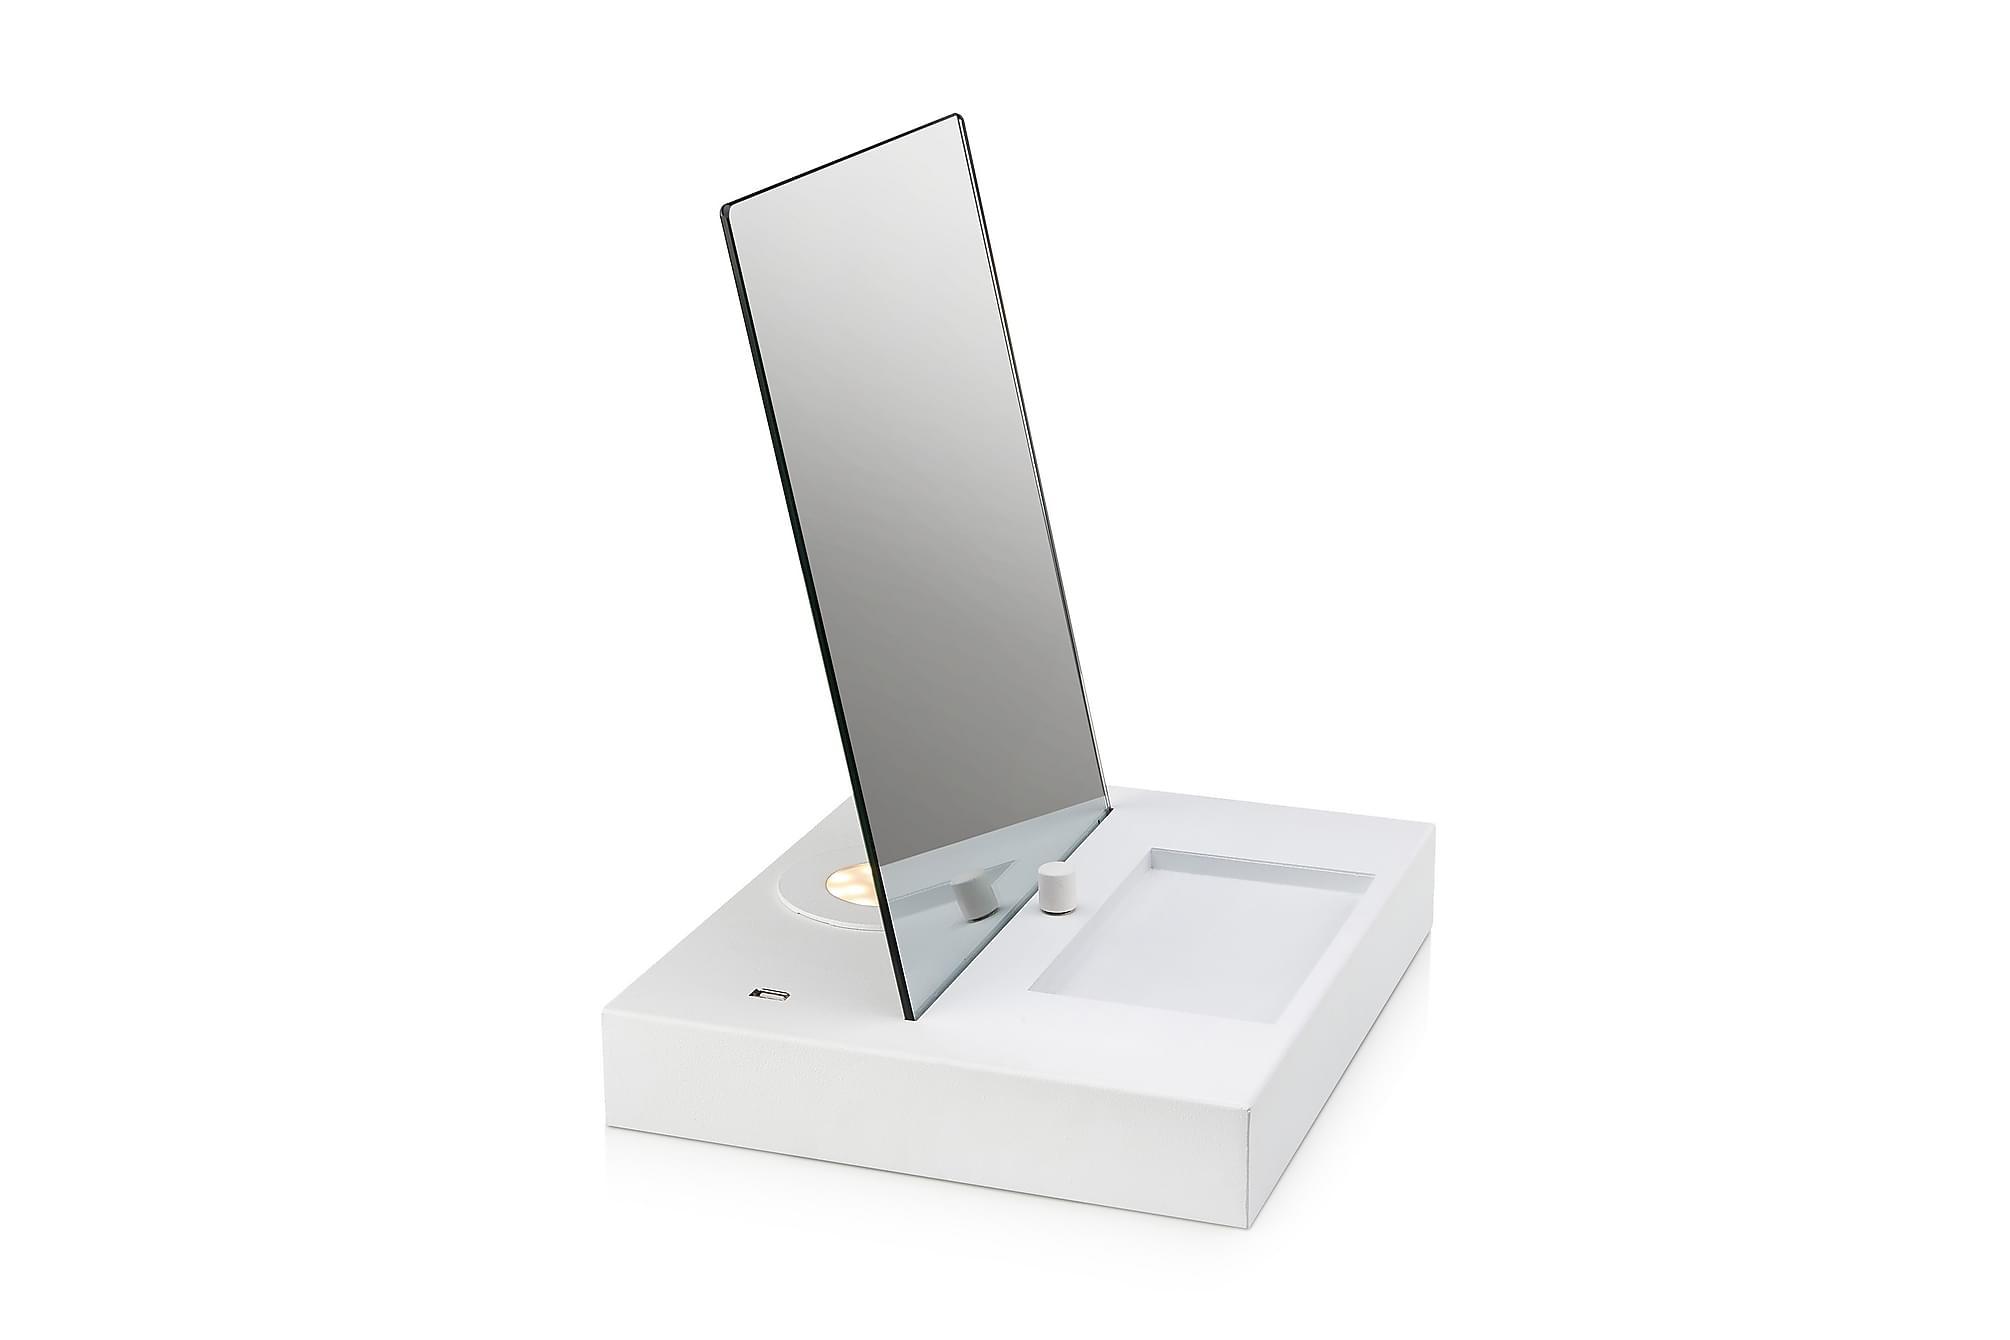 Reflect bordslampa usb spegel/svart